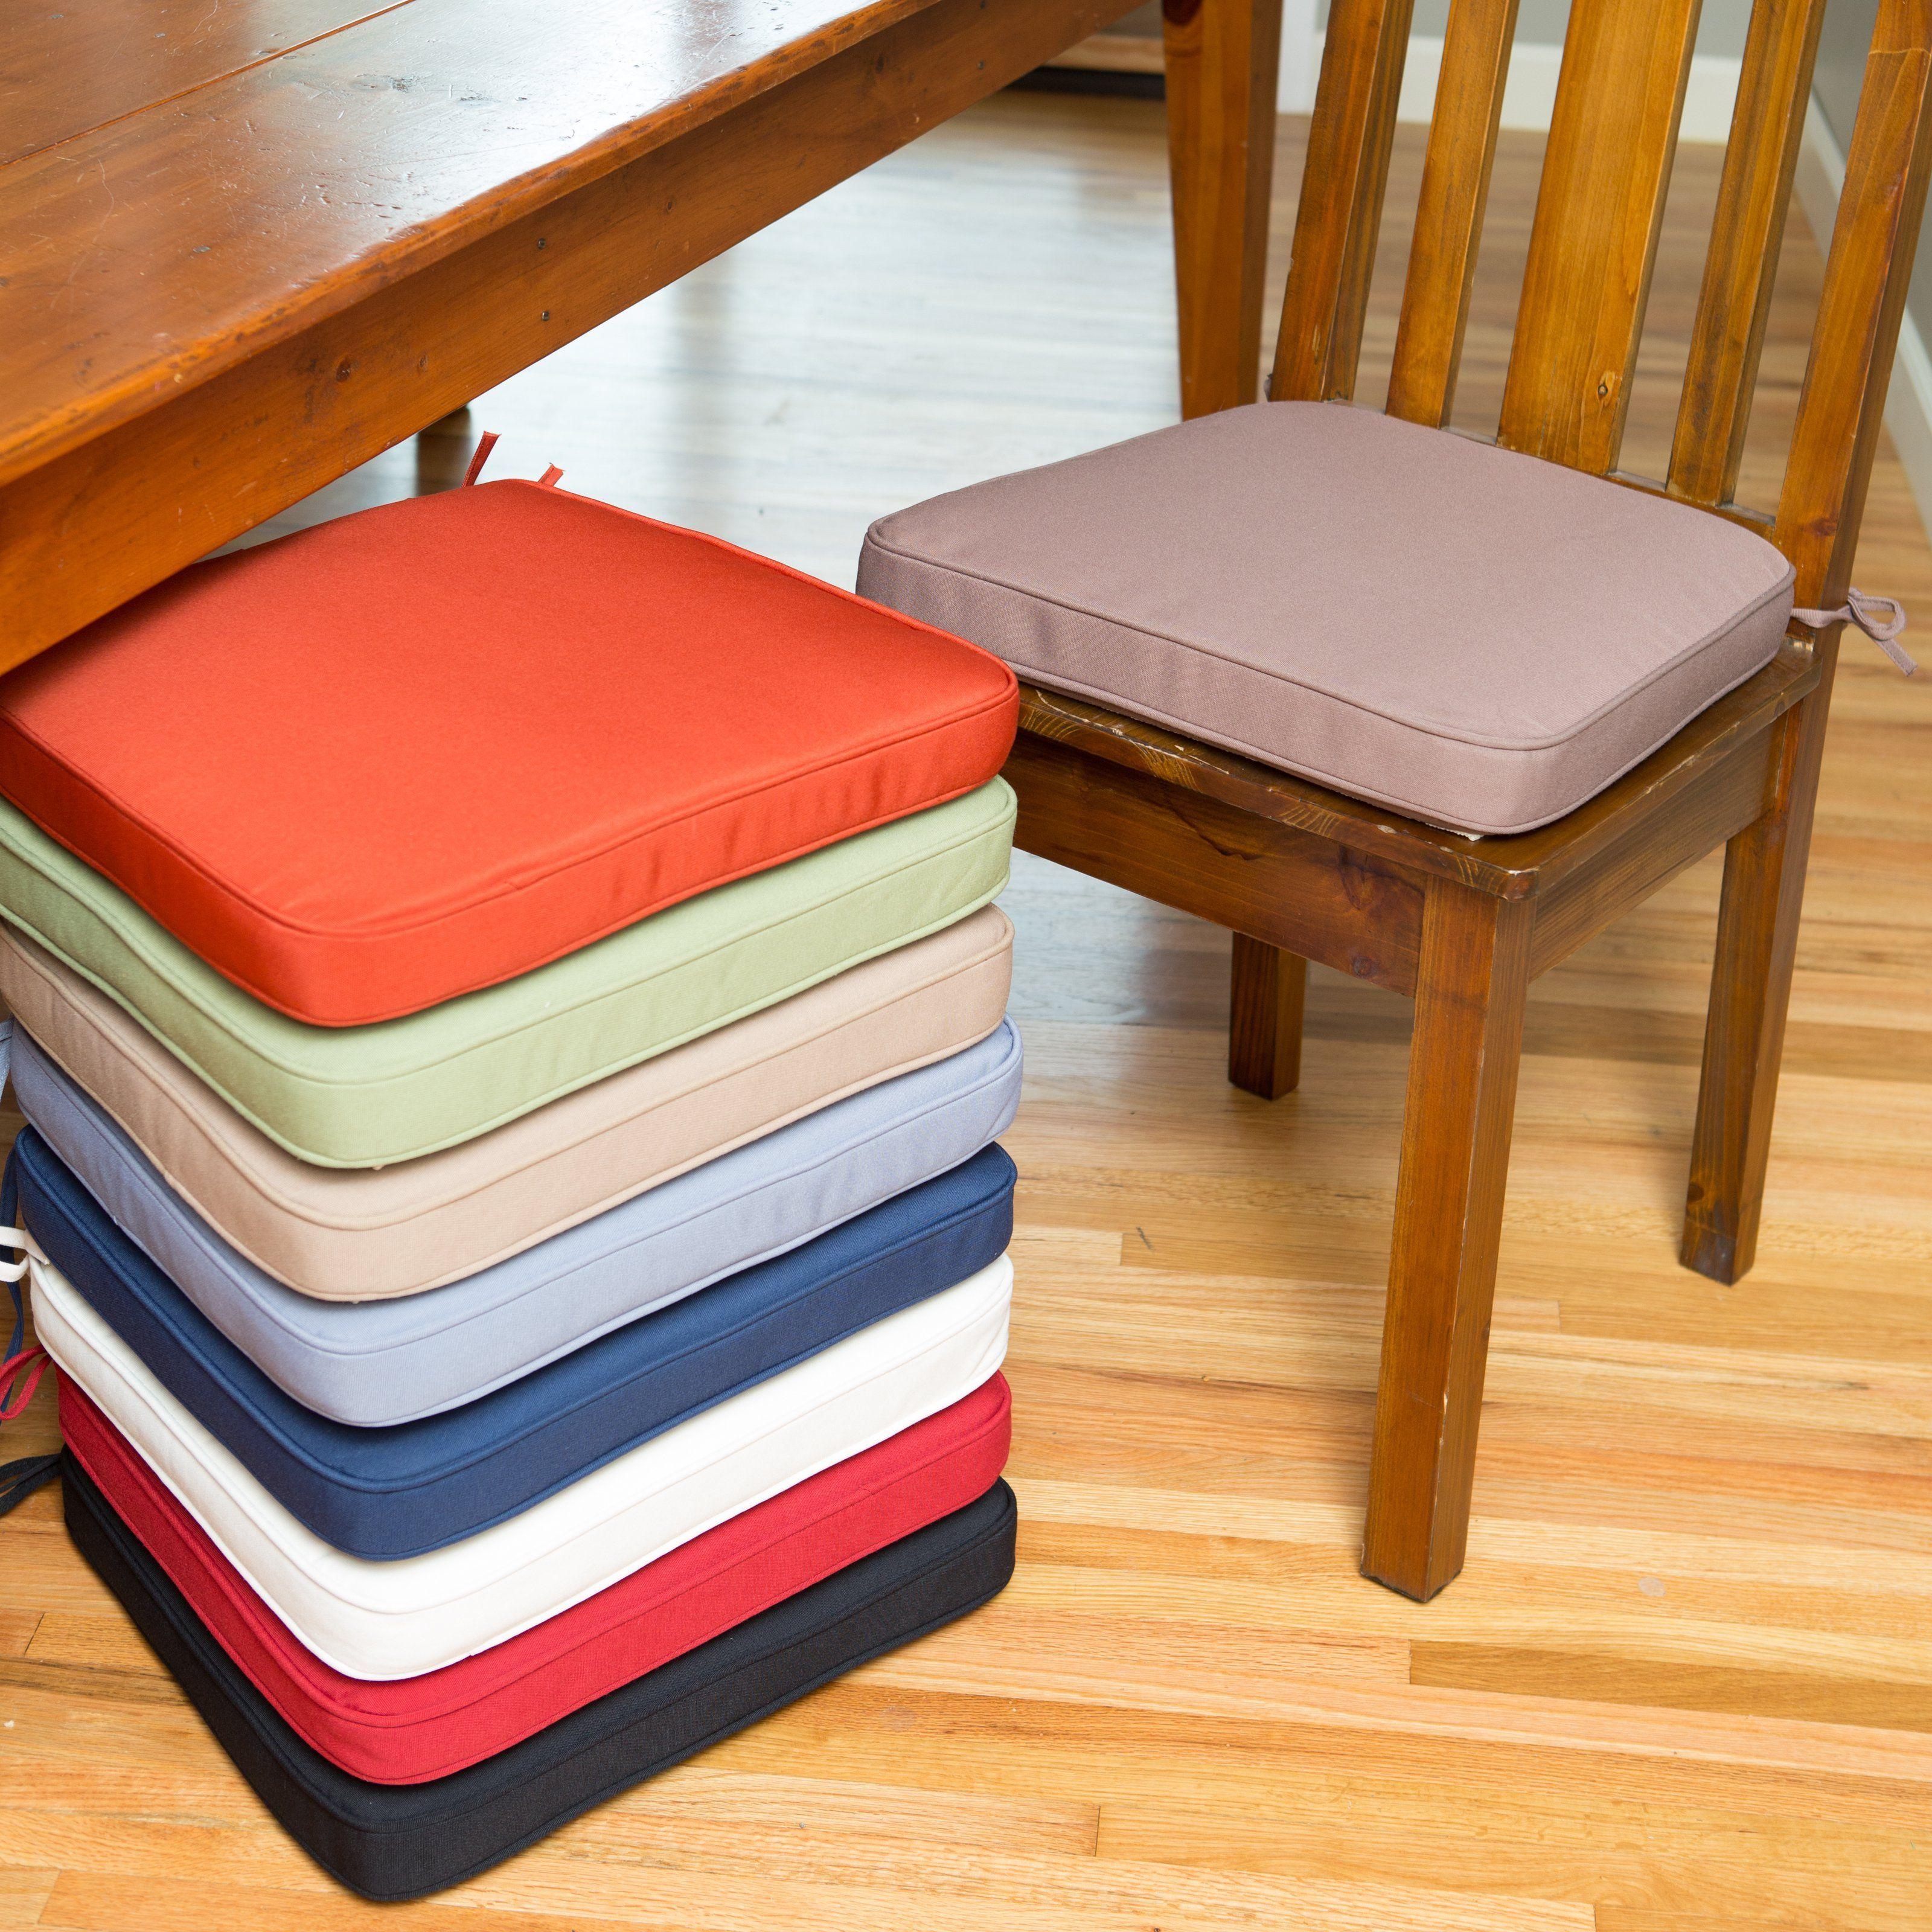 18 Beautiful Indoor Dining Room Chair Cushions Inspiring 2019